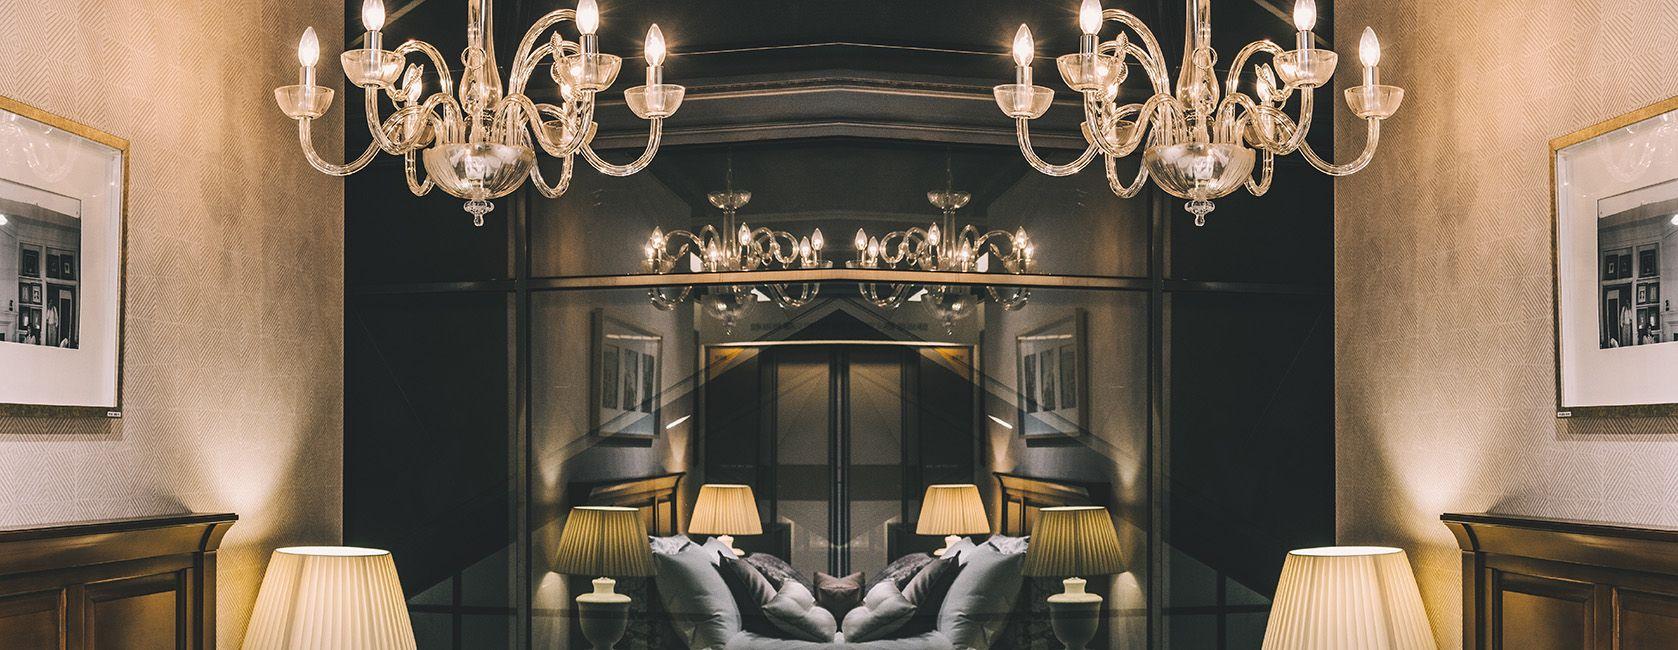 Blog-Lighting-Painting-your-Home-Blog-Header